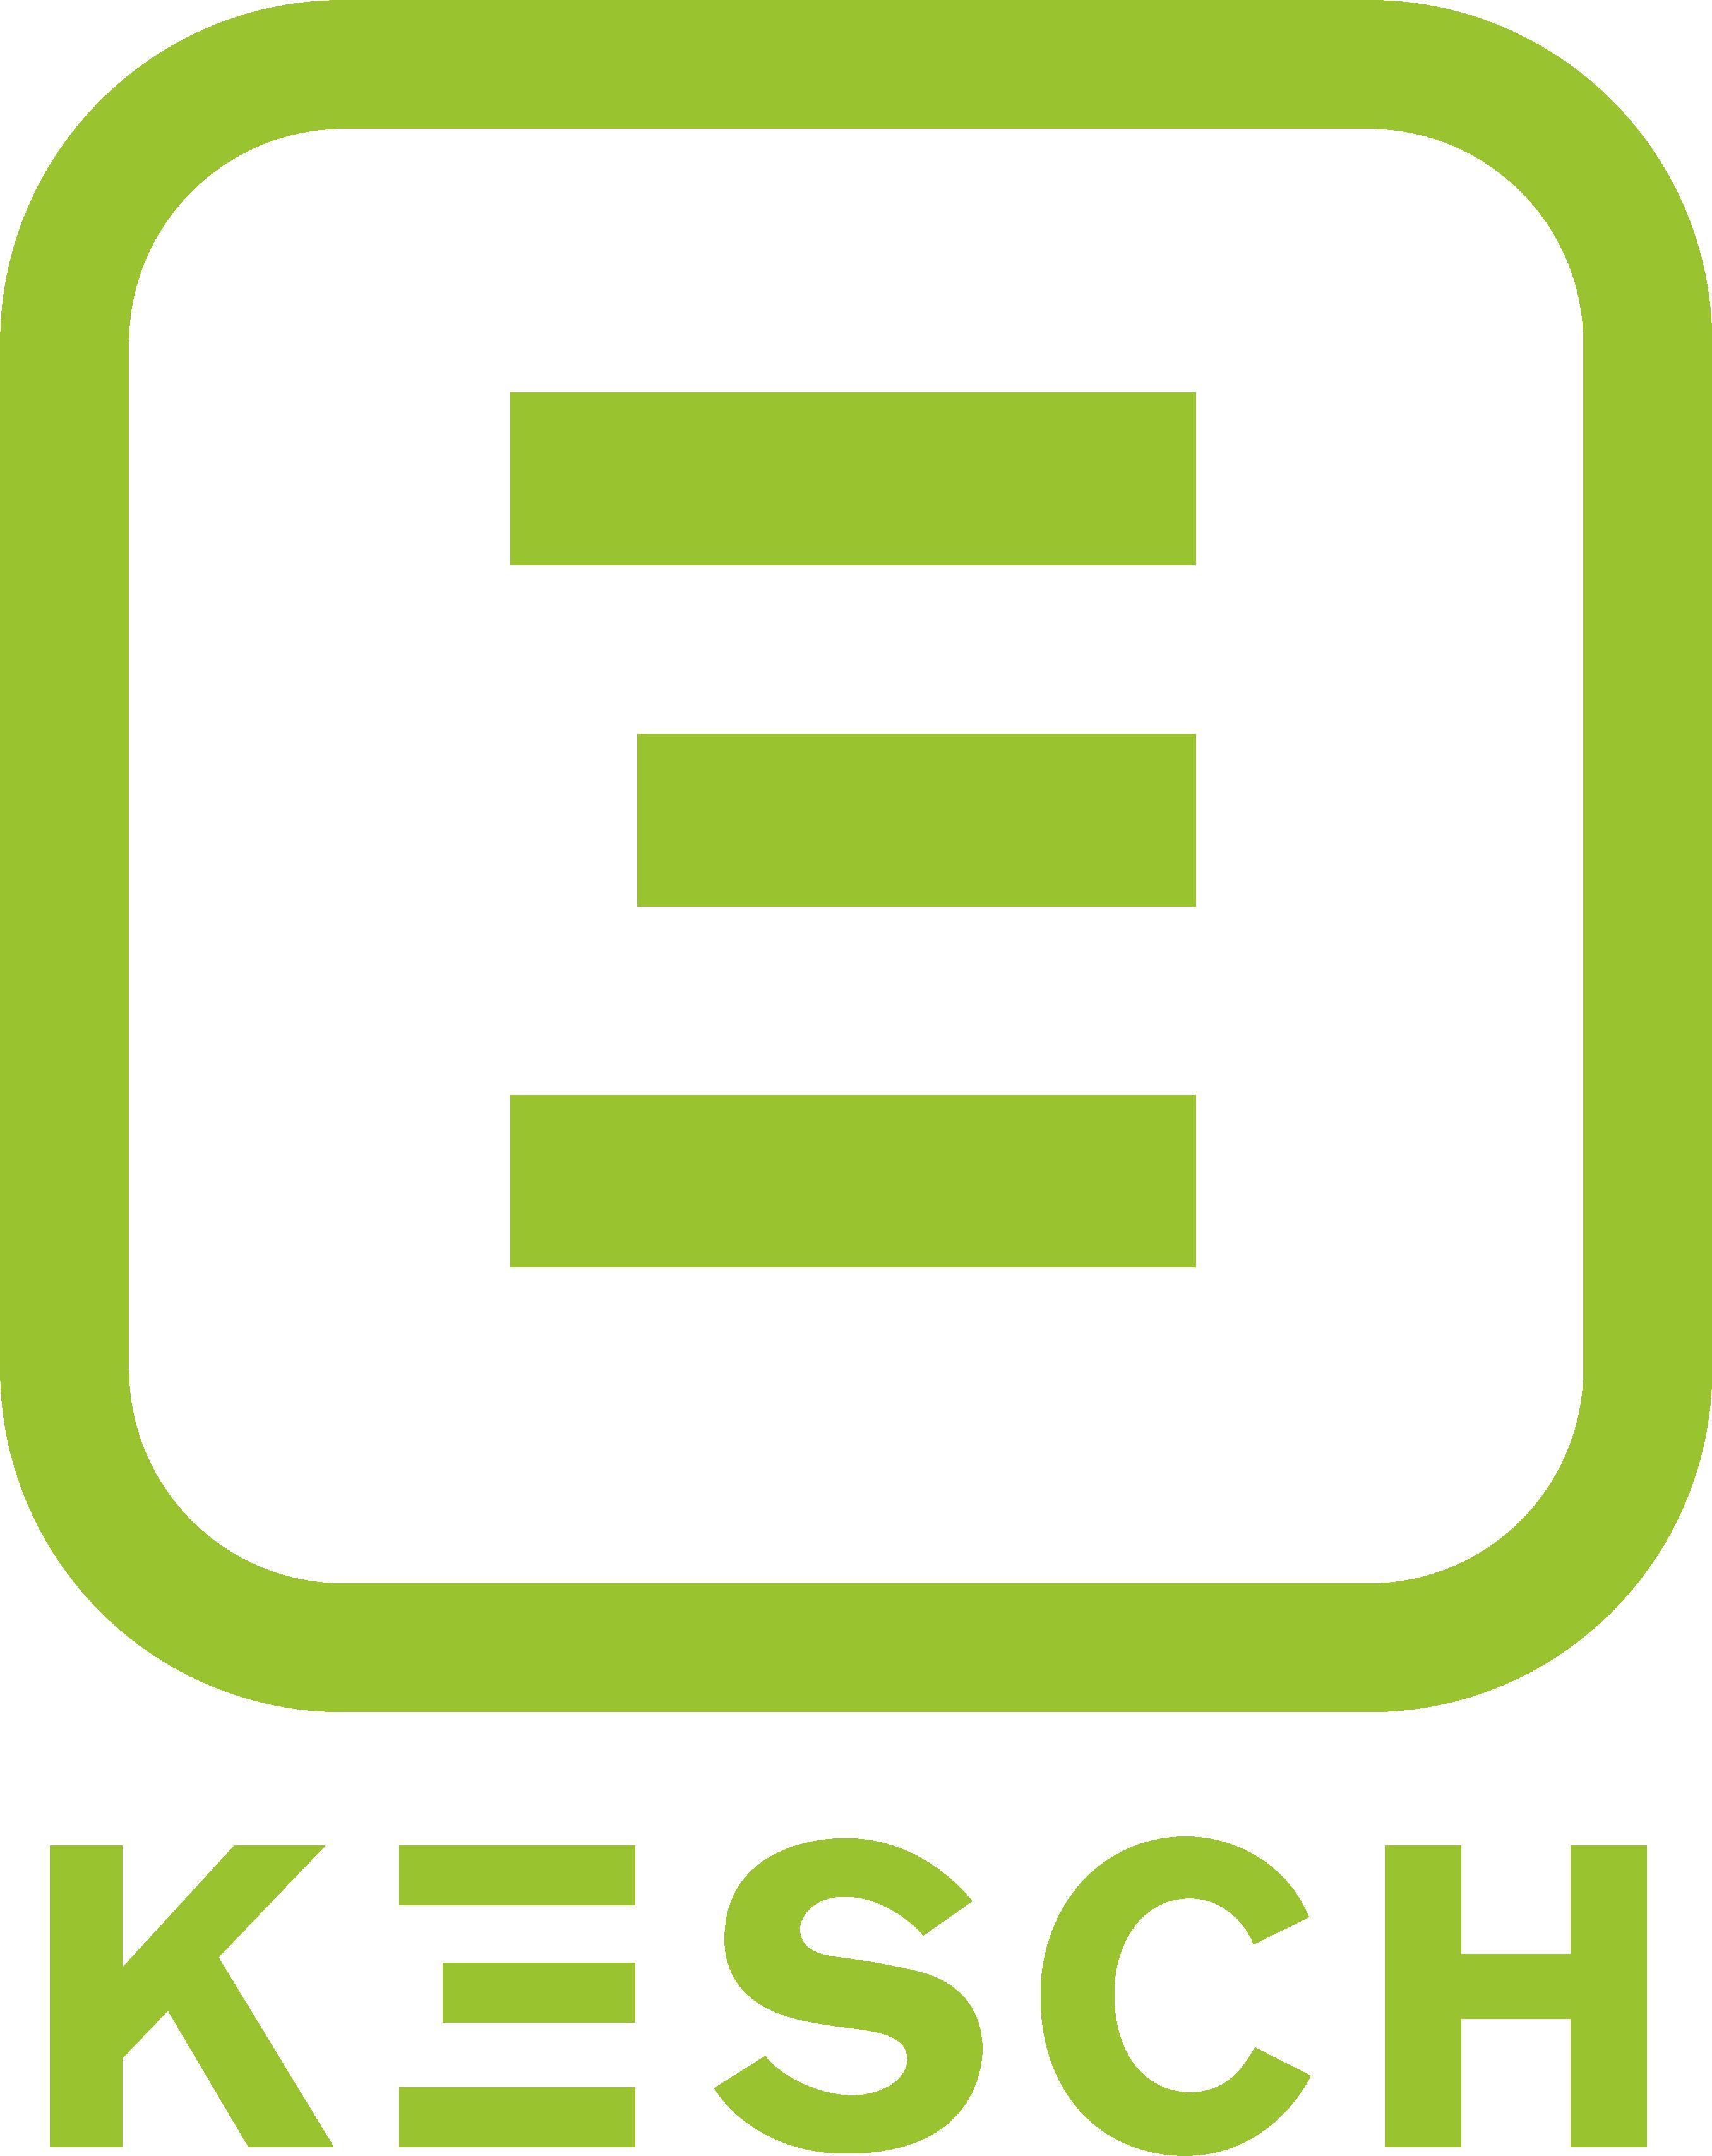 KESCH Event & Promotion GmbH